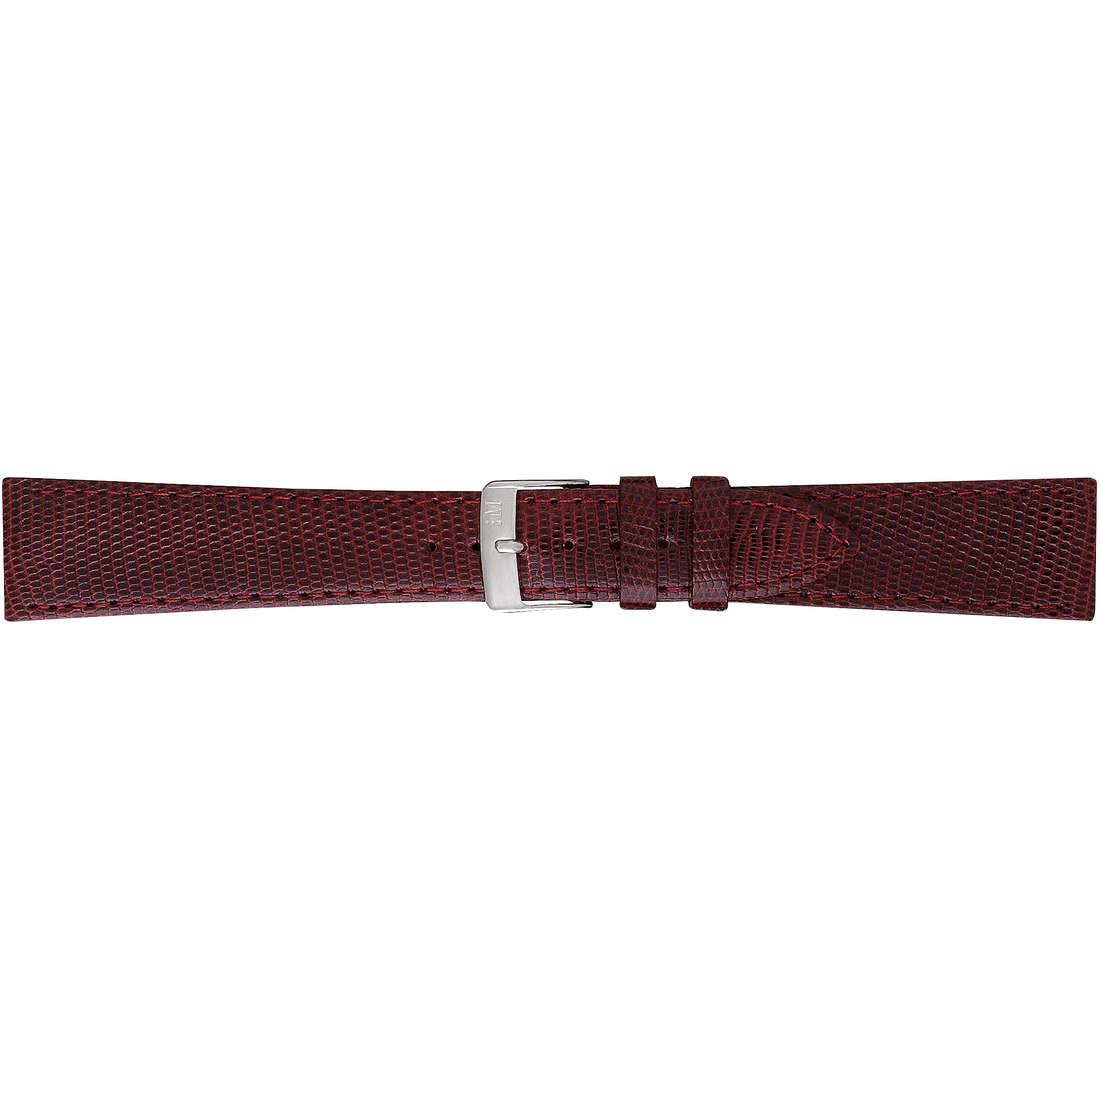 watch watch bands watch straps man Morellato Pelli Preziose A01U0858040082CR18